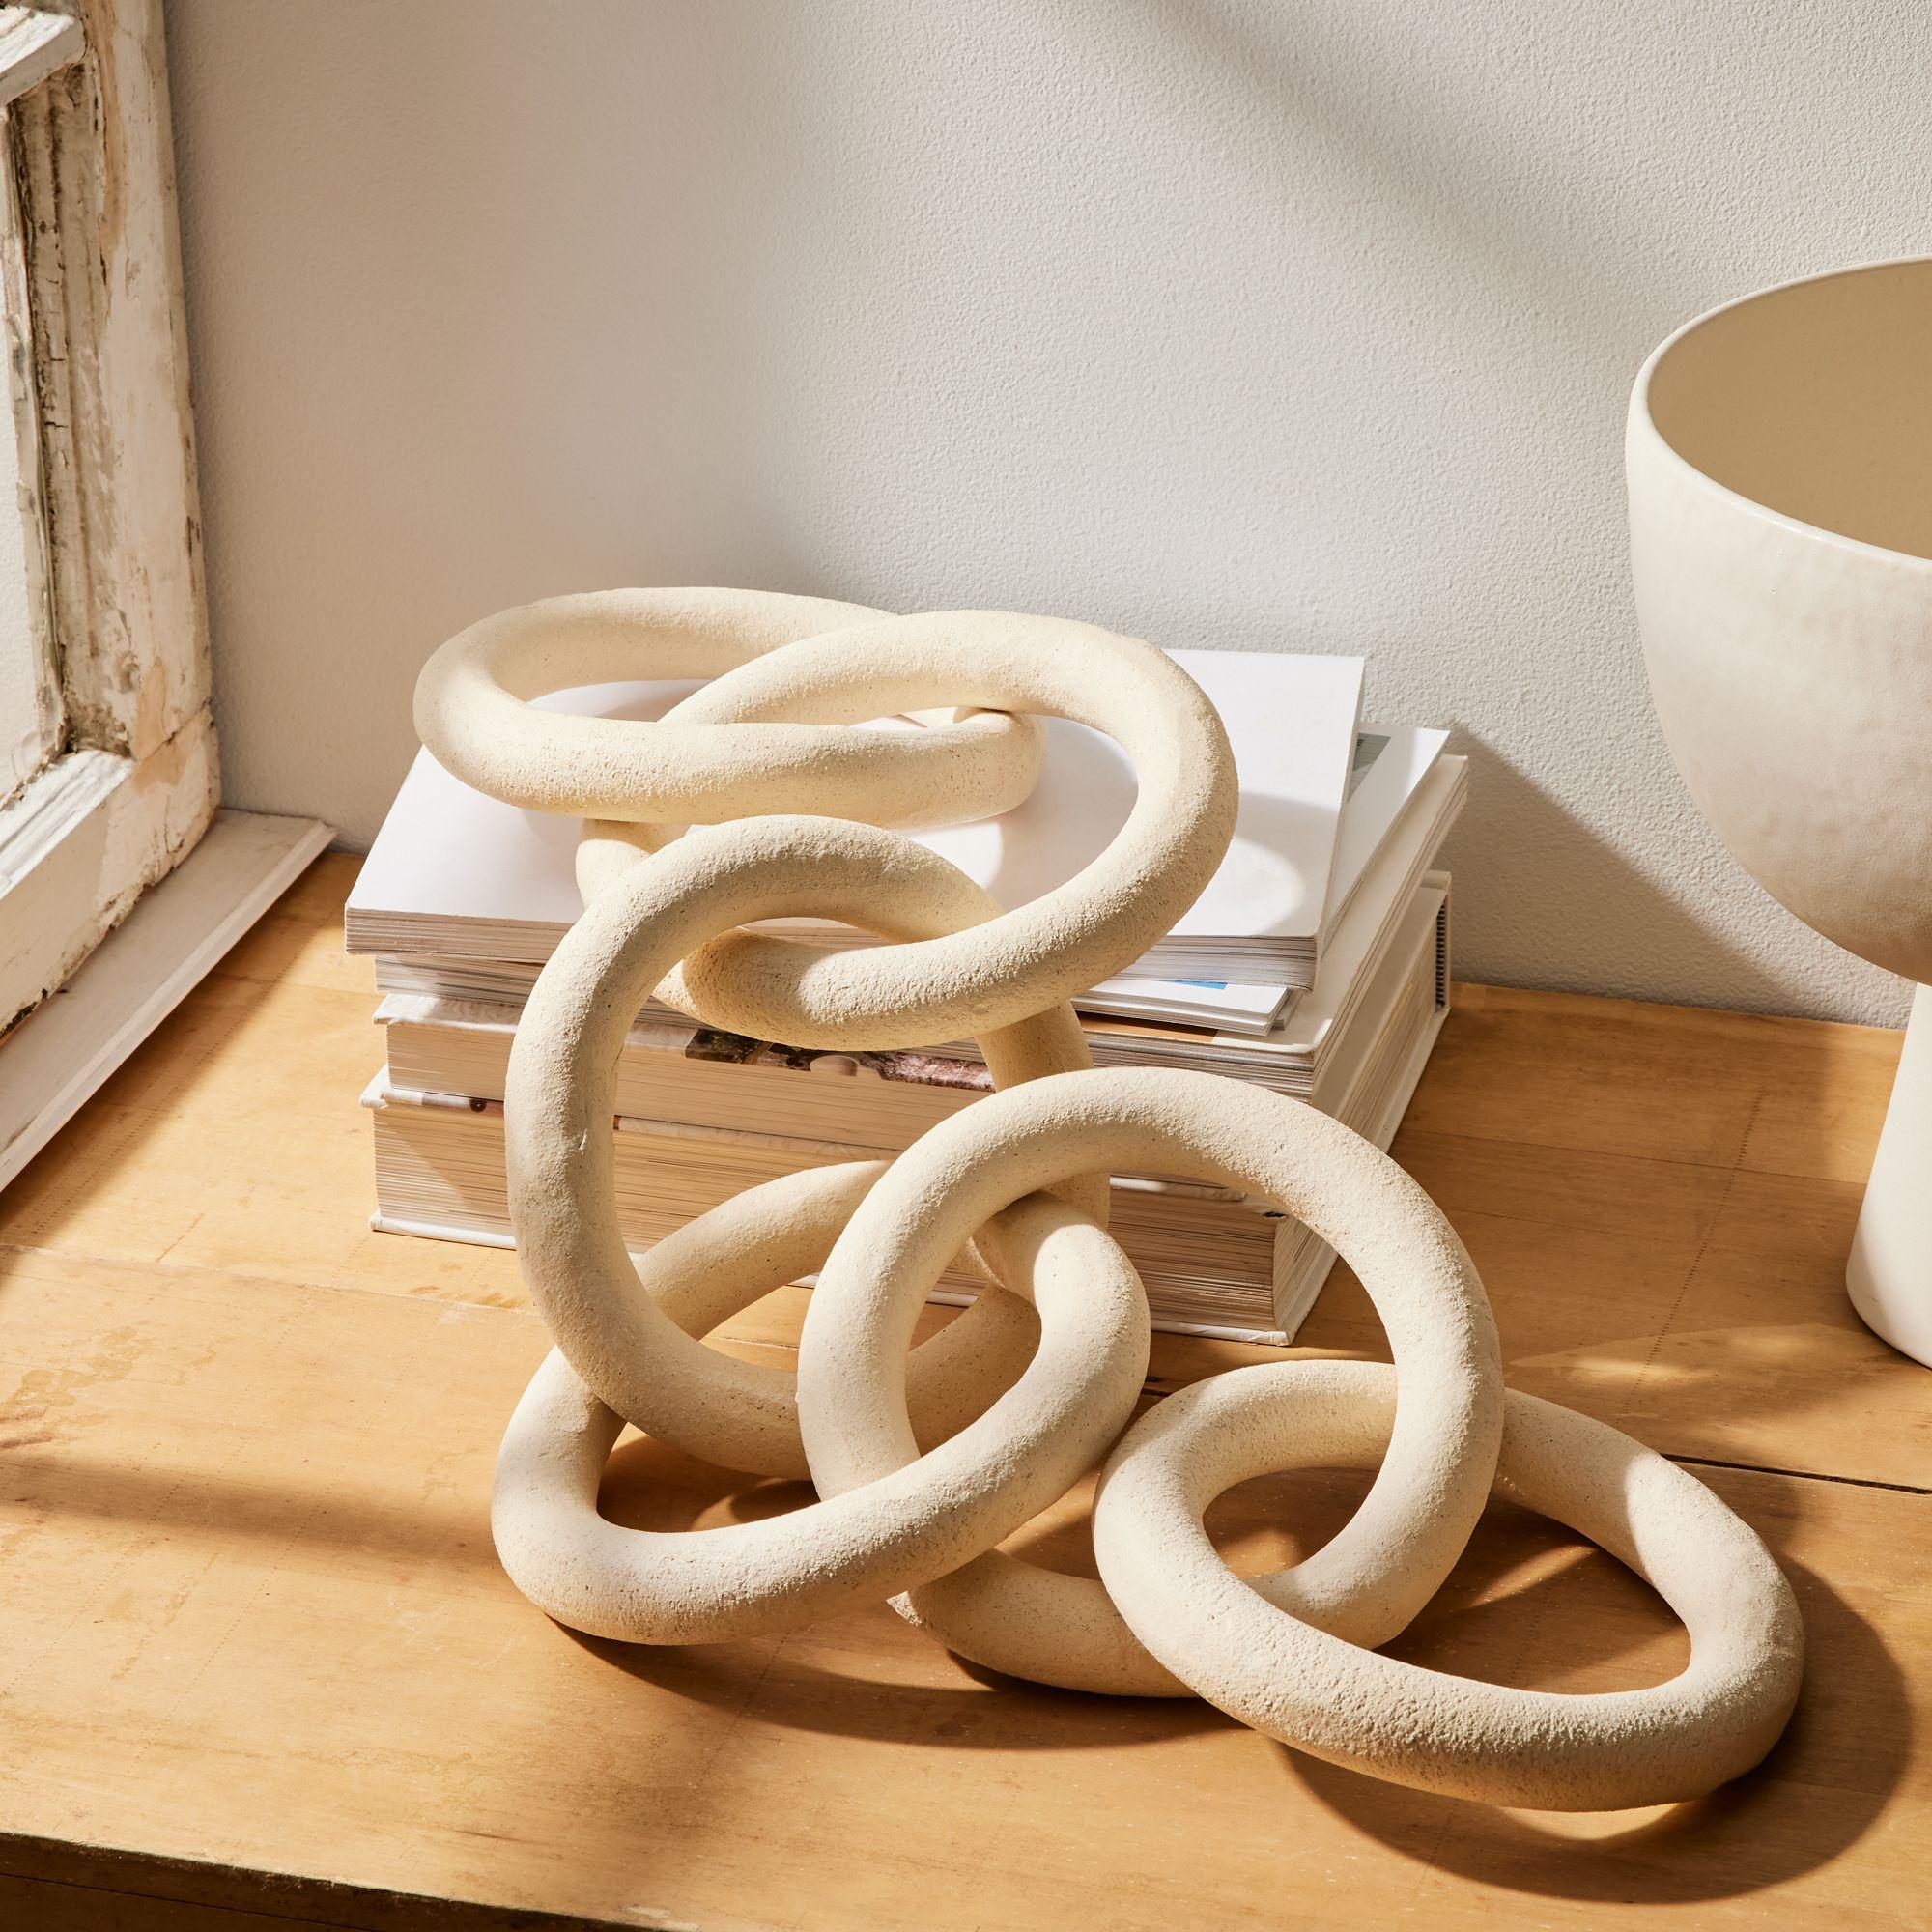 Six Link Ceramic Chain Sculpture $495